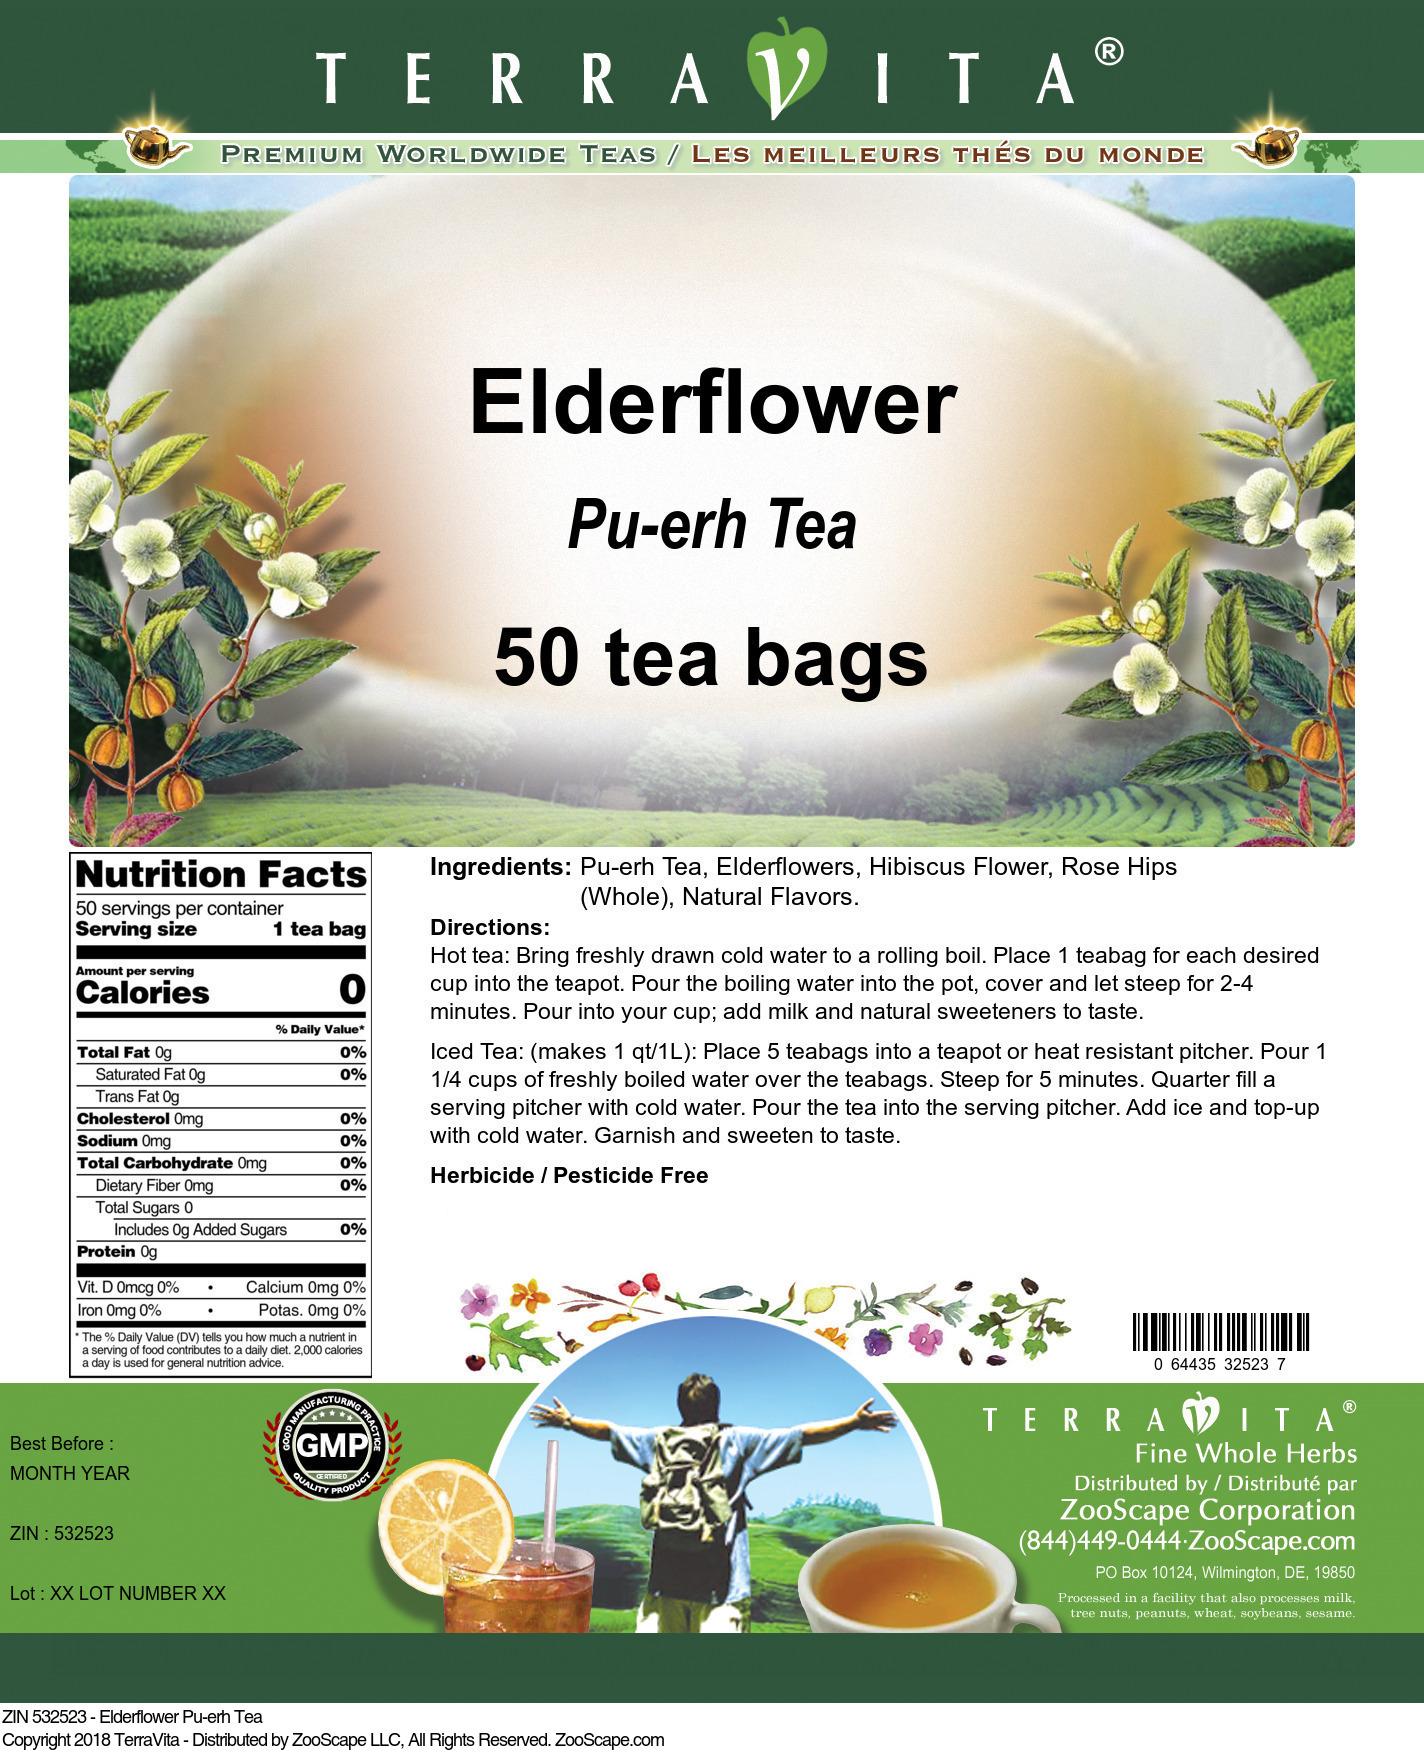 Elderflower Pu-erh Tea